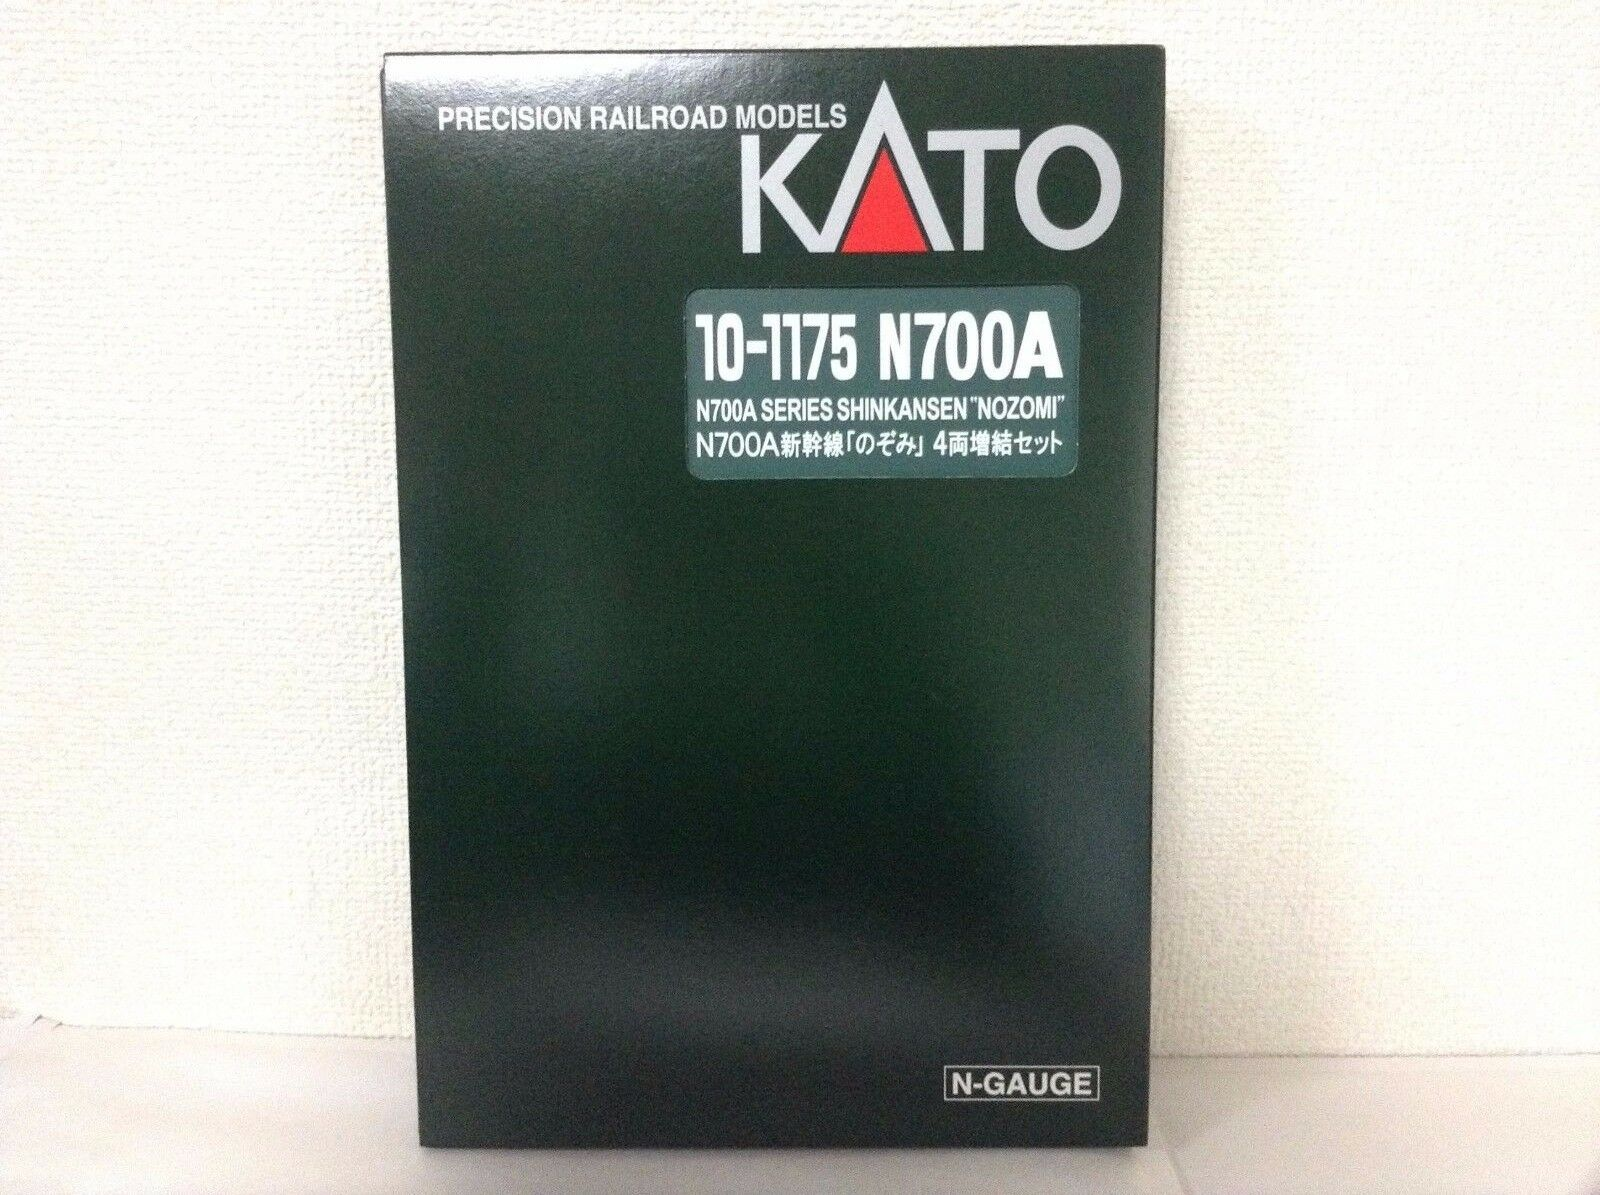 Kato 10-1175 Shinkansen Serie N700A Nozomi Add-On 4-Car Set F S